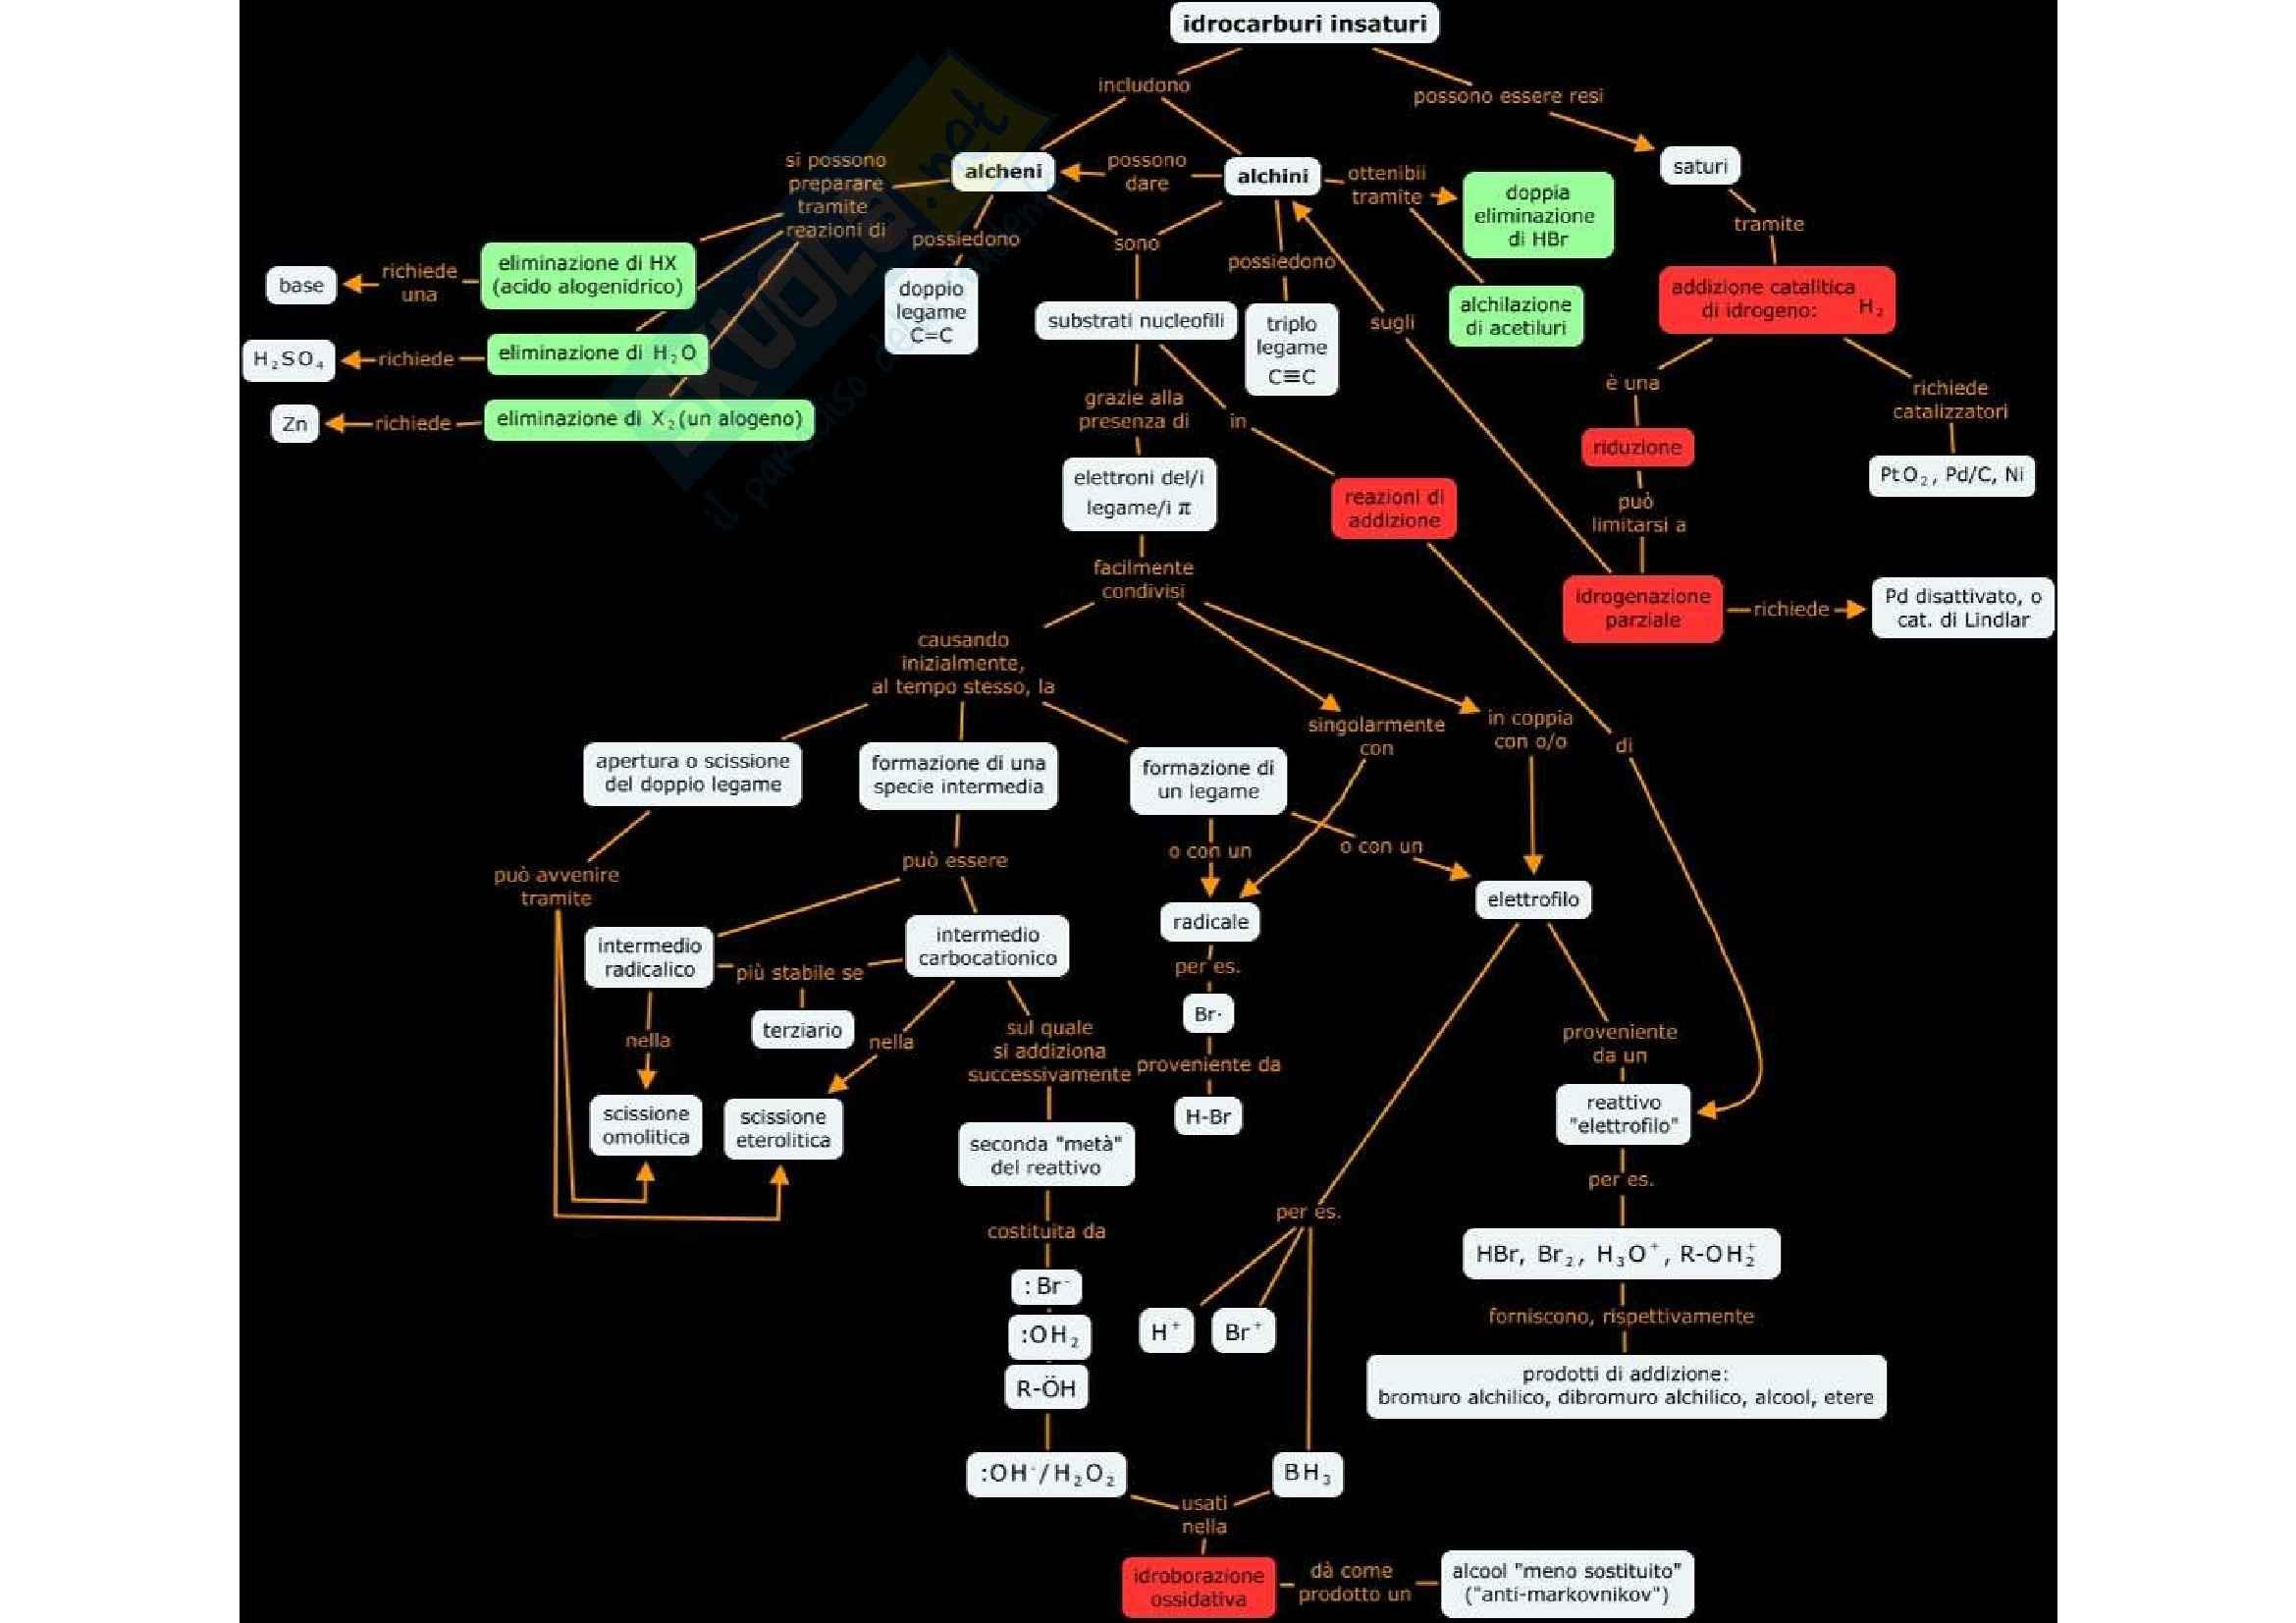 Chimica organica - schema sugli idrocarburi insaturi